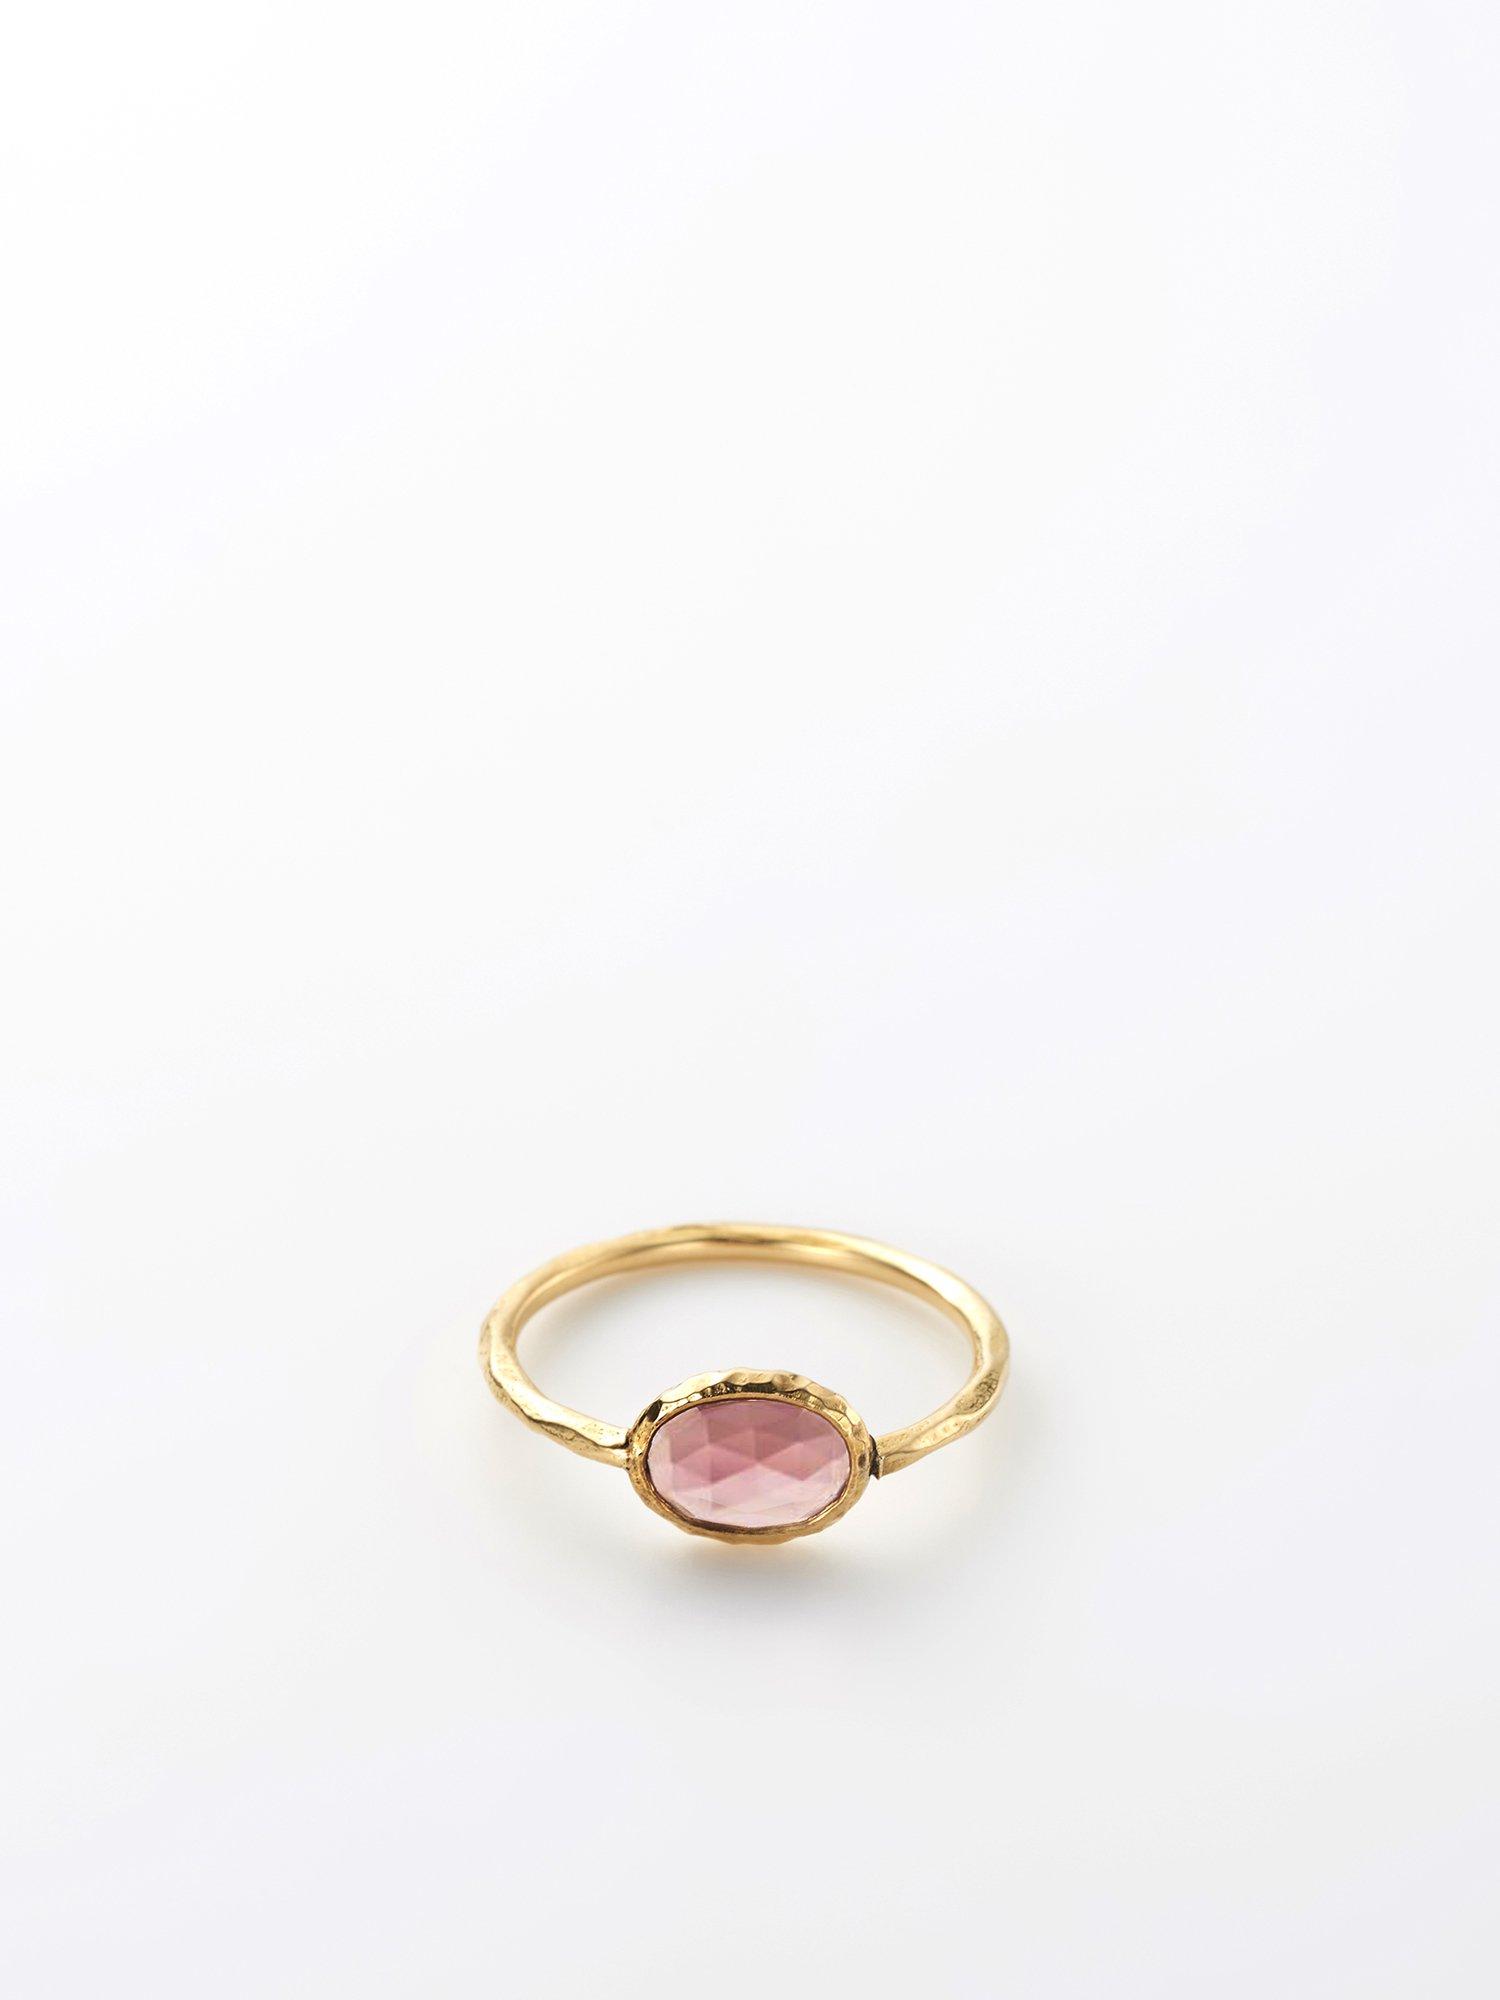 HISPANIA / Hispania lux ring / Pink tourmaline